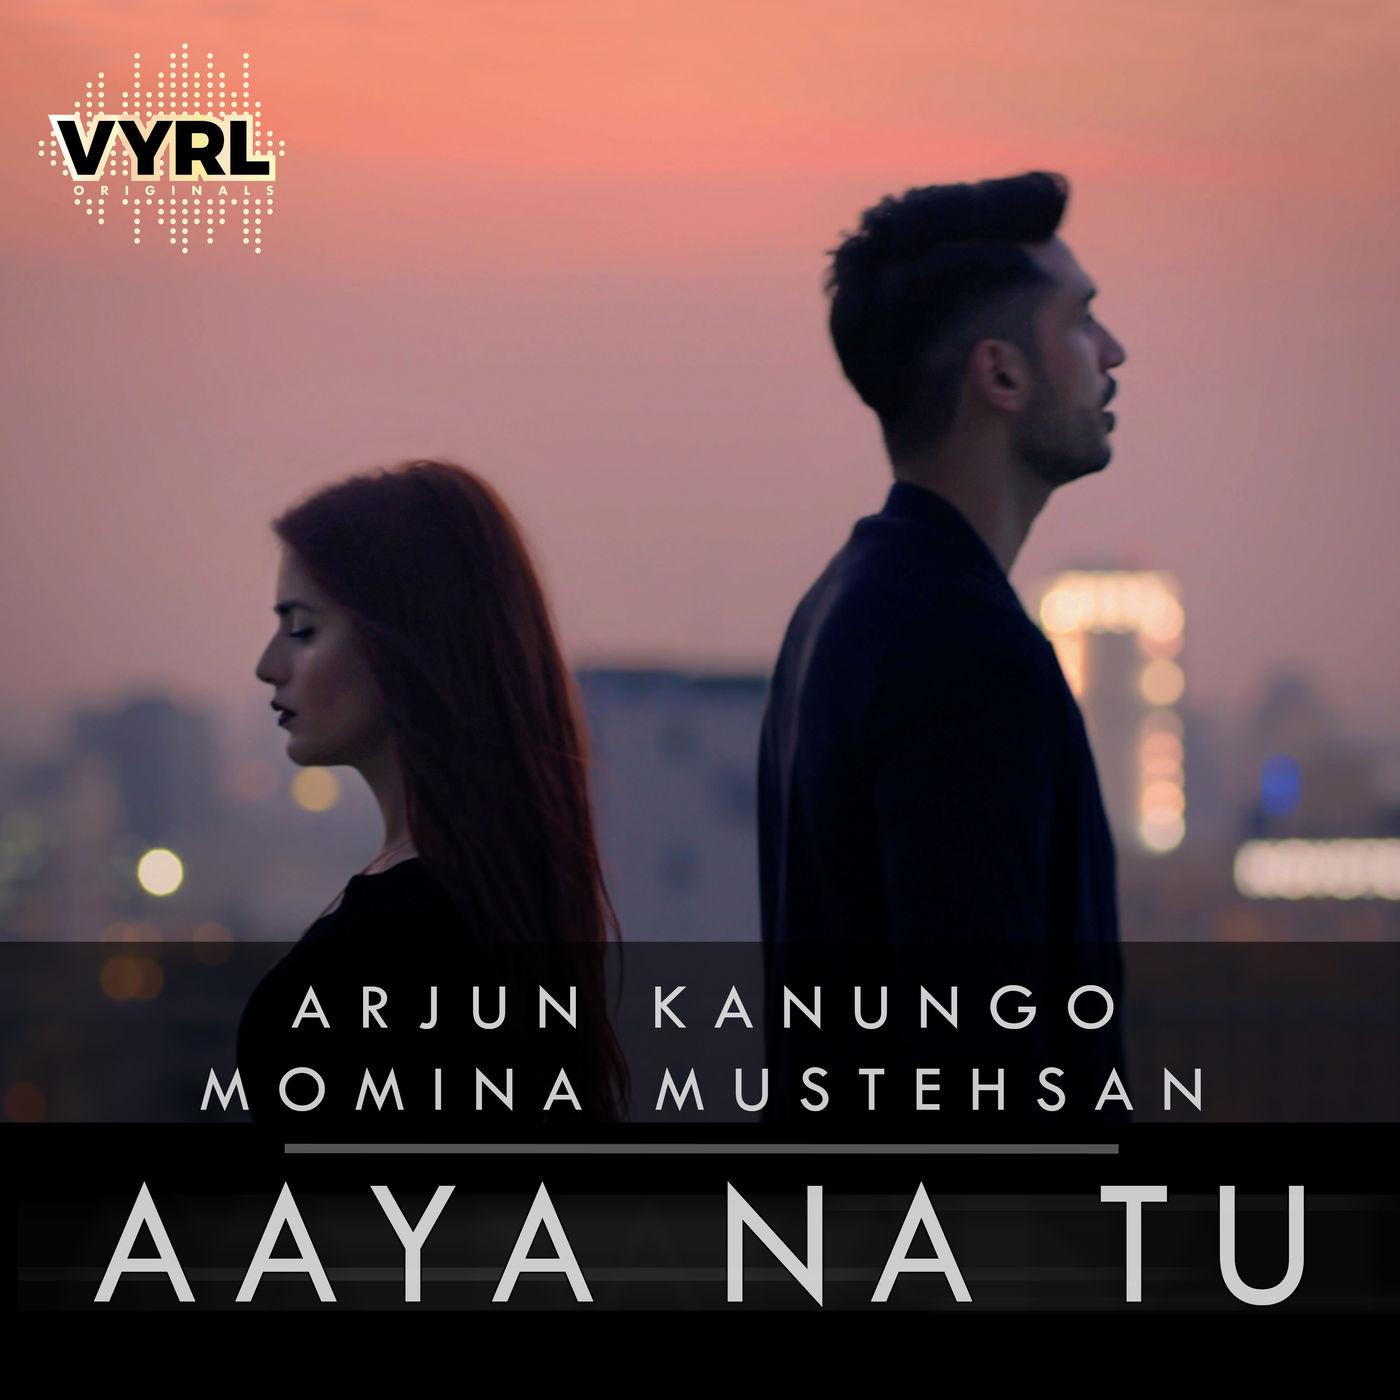 Arjun Kanungo & Momina Mustehsan – Aaya Na Tu – Single [iTunes Match M4A] | iplusall.4fullz.com